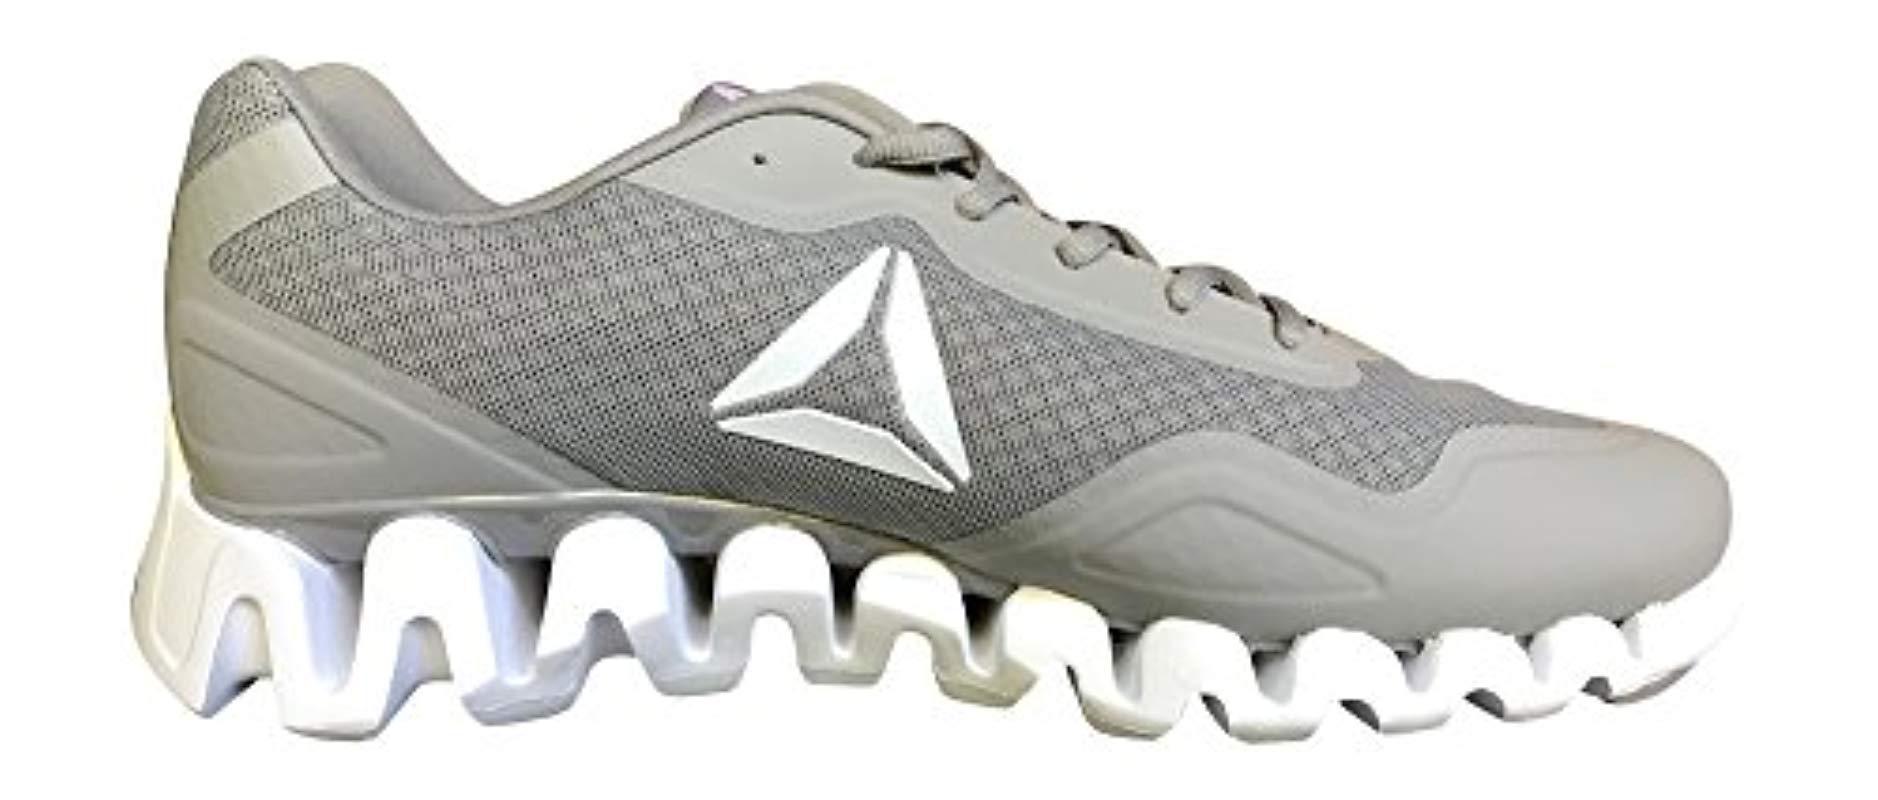 Reebok - Gray Zigpulse Running Shoe Carbon for Men - Lyst. View fullscreen 24cb063ec